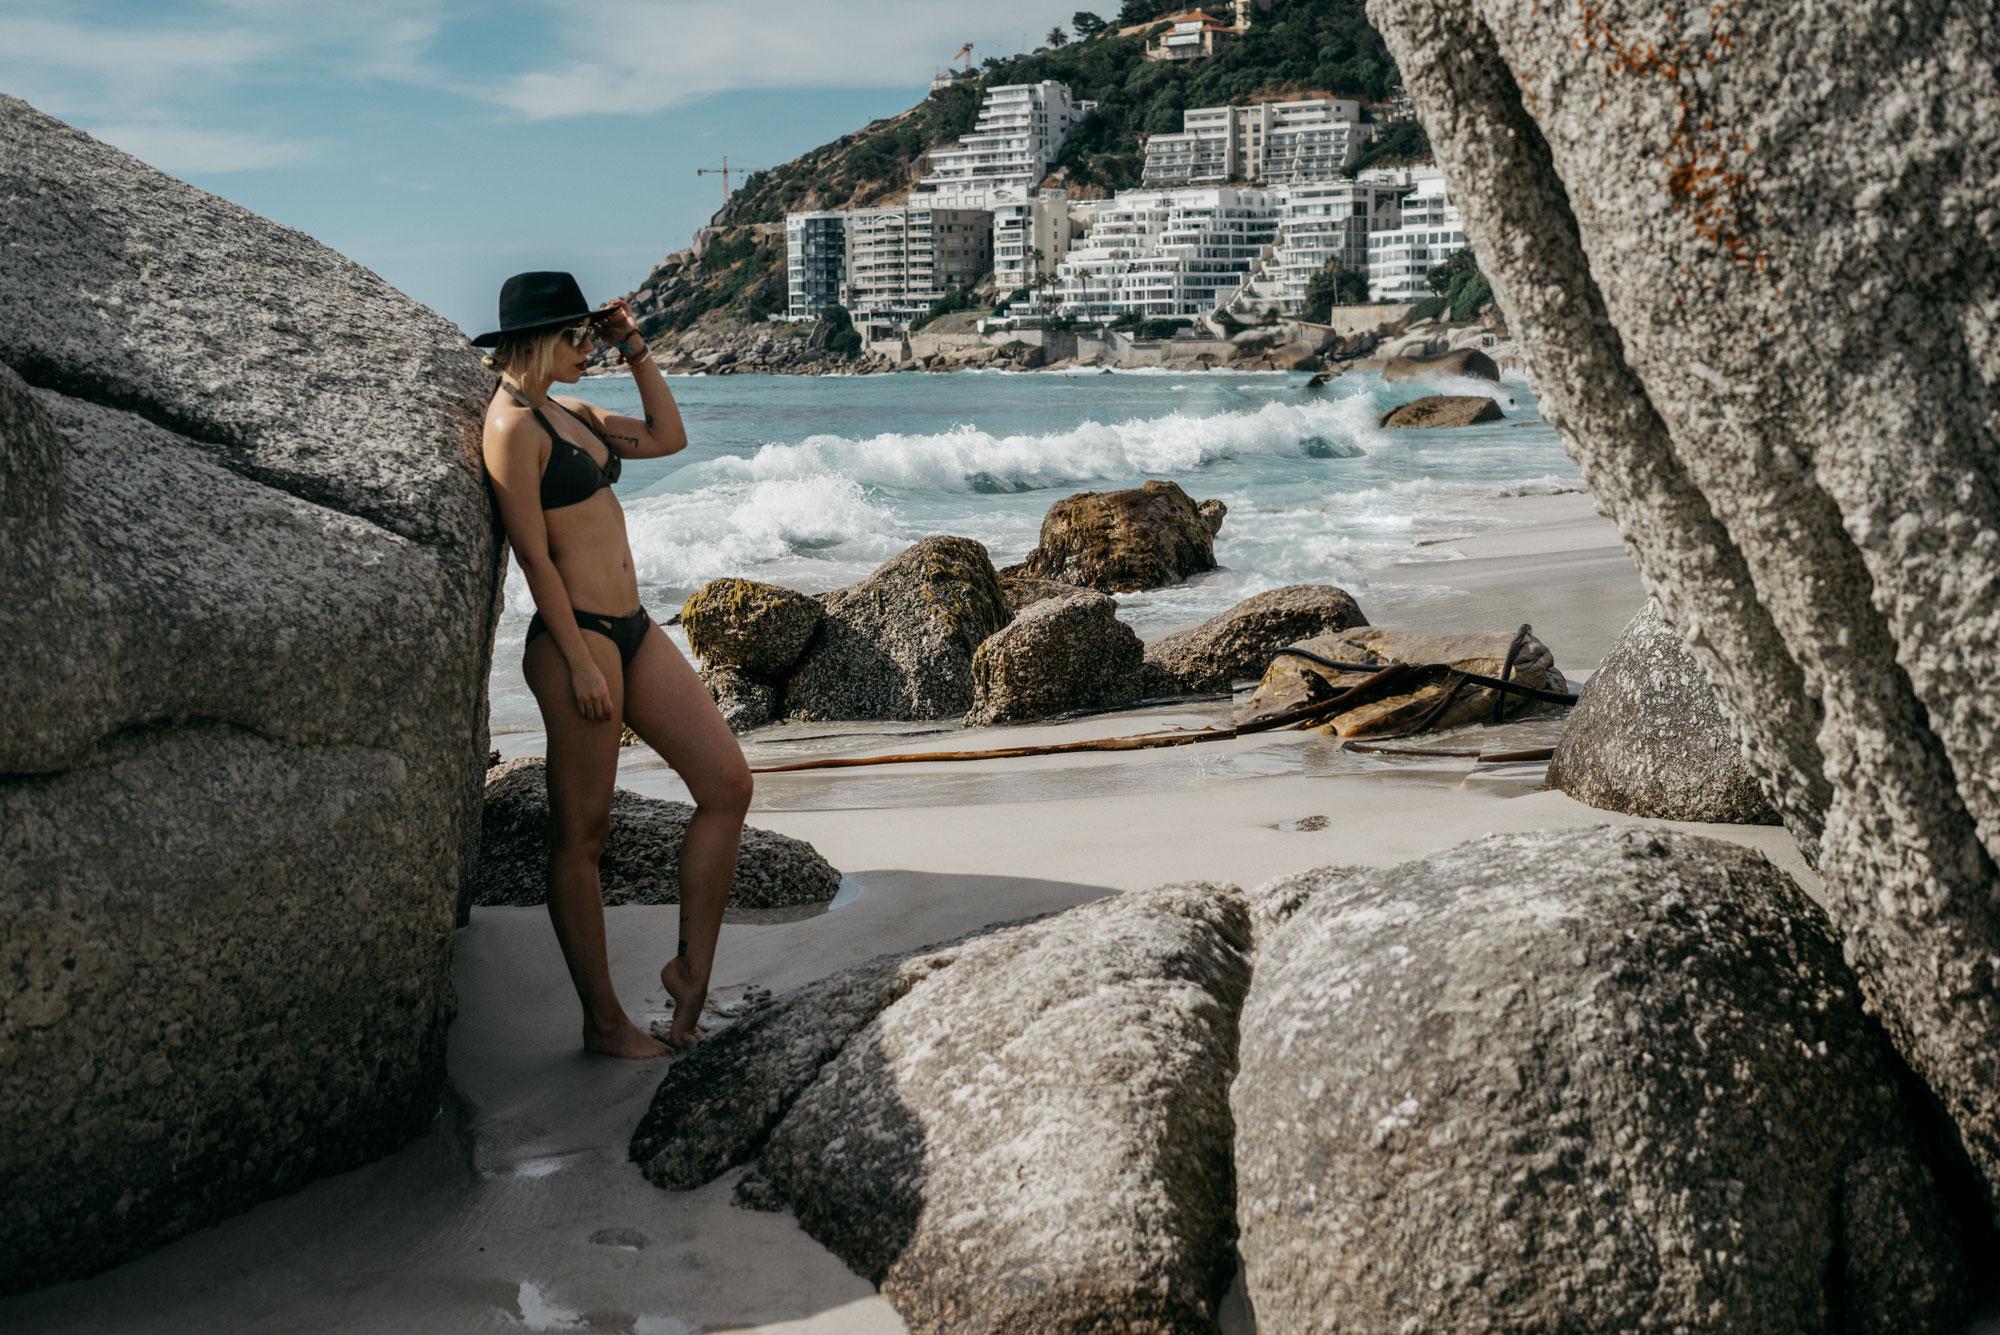 Cape Town, Ocean View | Bikini moments